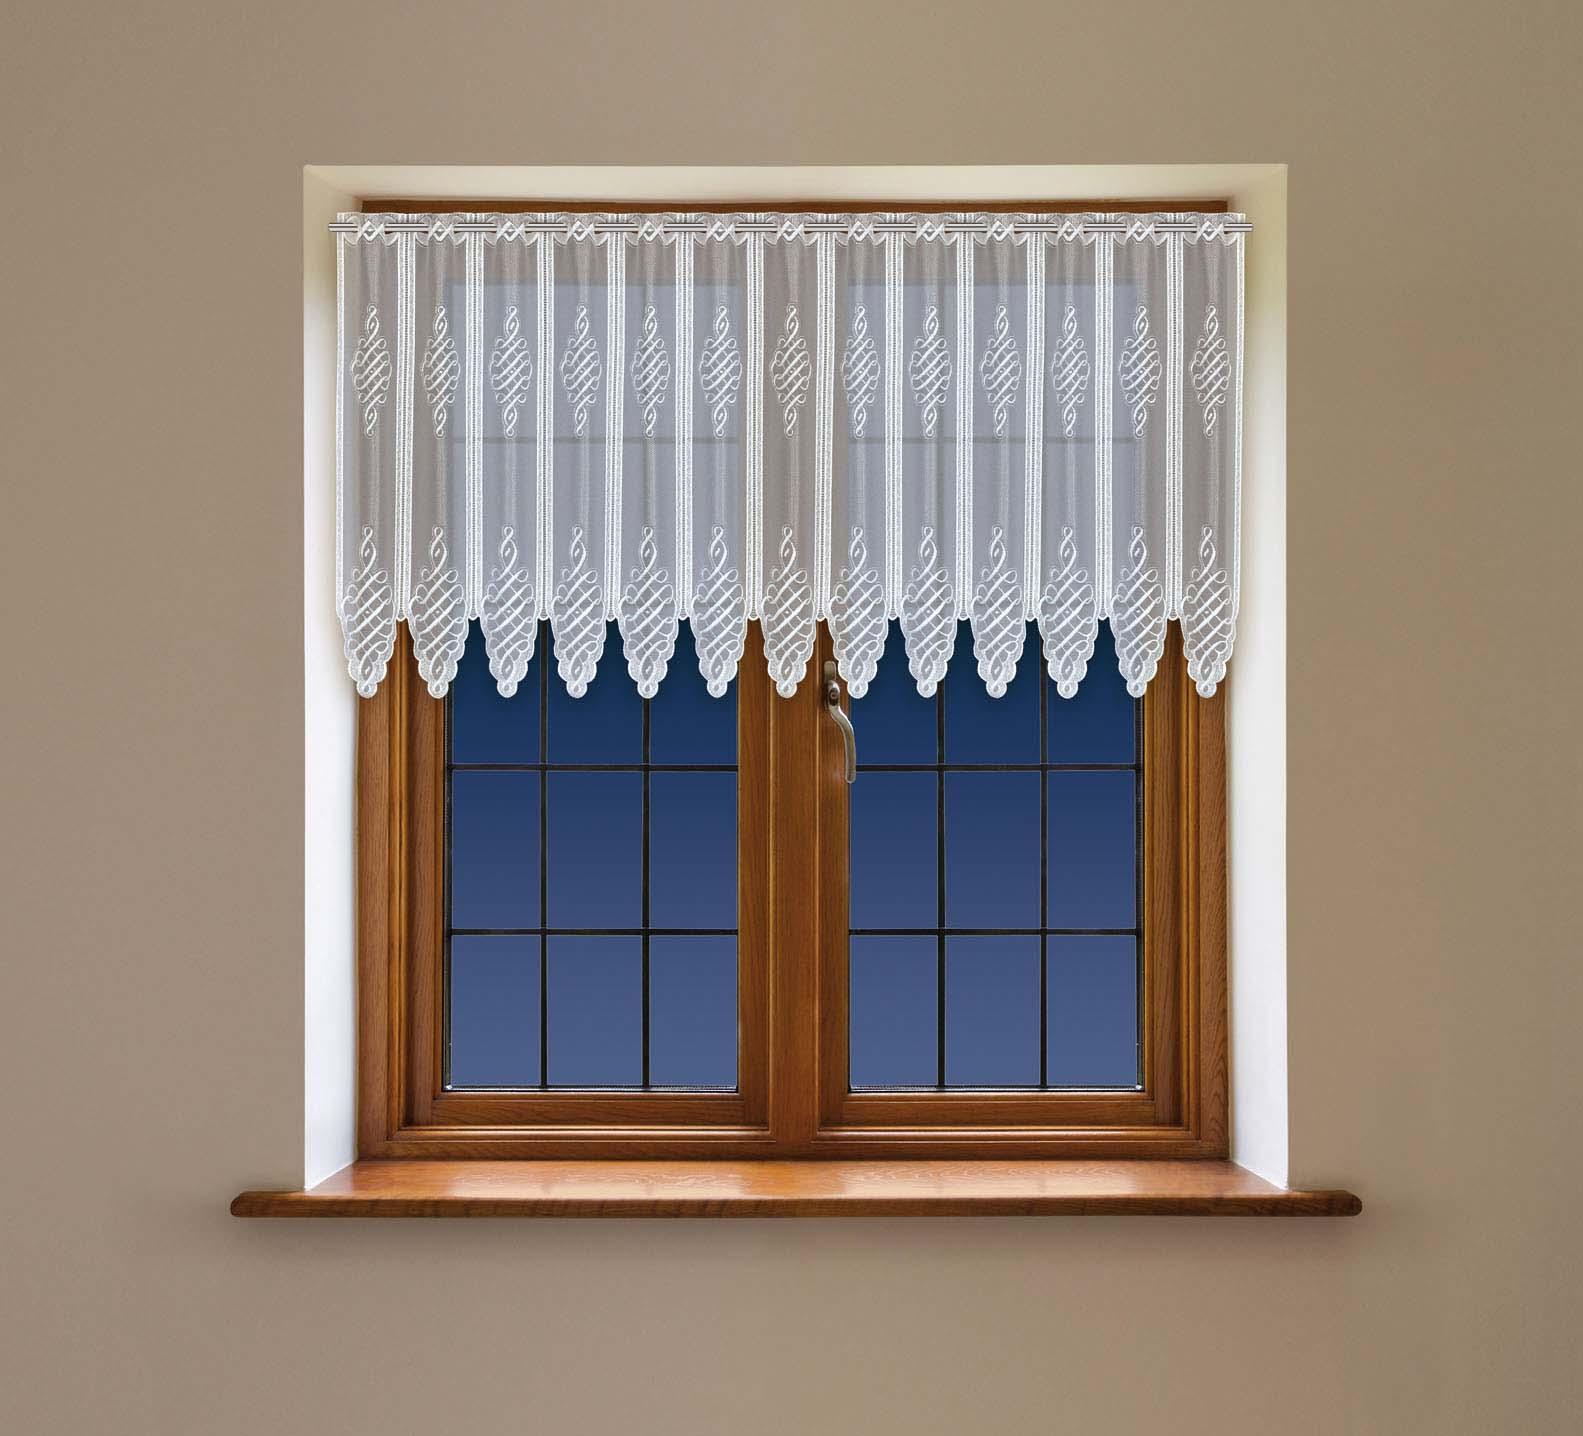 meterware scheibengardine er ka scheibengardinenstoffe meterware gardinen vorh nge. Black Bedroom Furniture Sets. Home Design Ideas